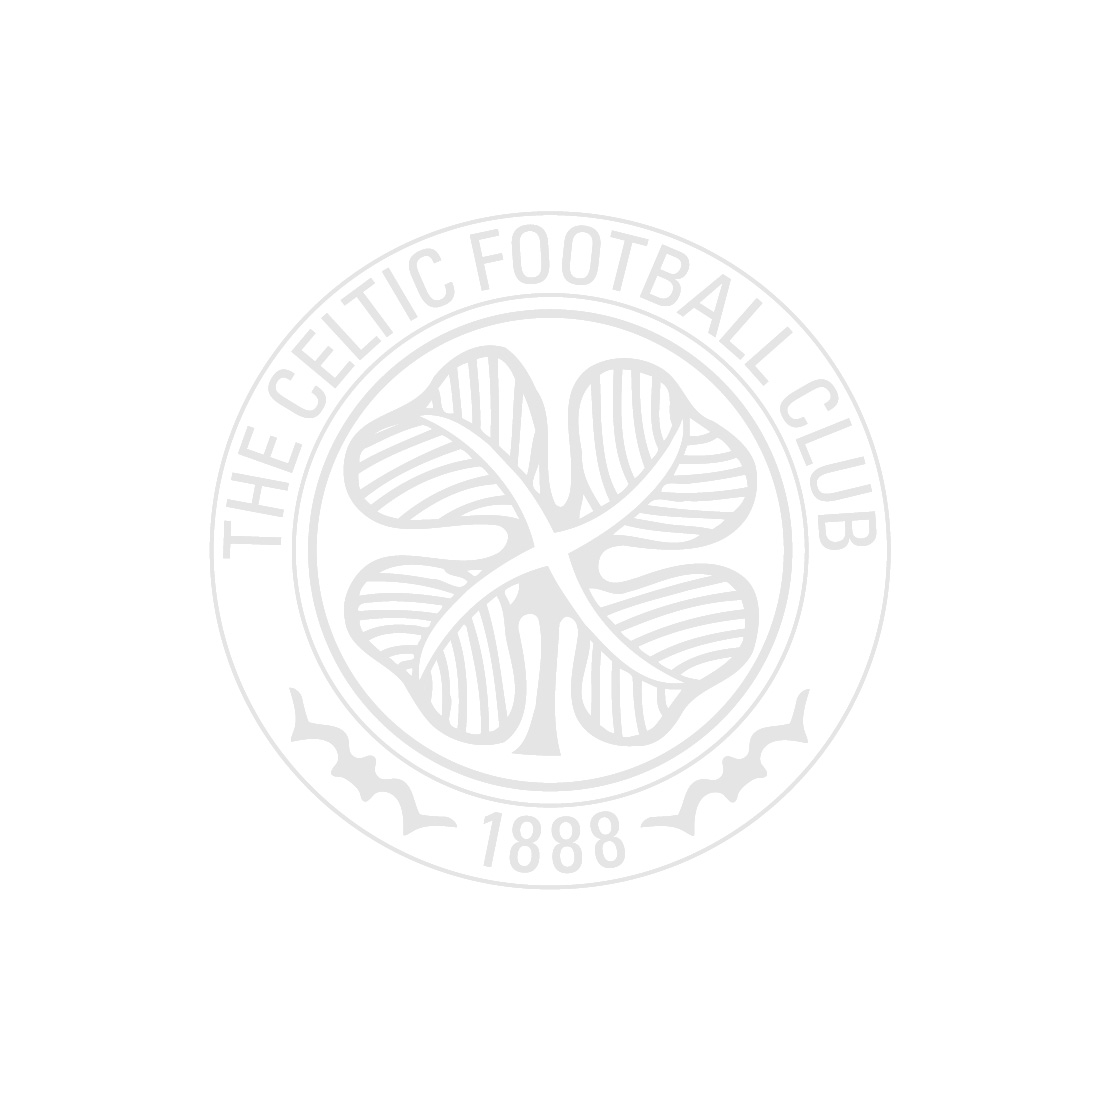 Celtic Tonal Crest Bootbag